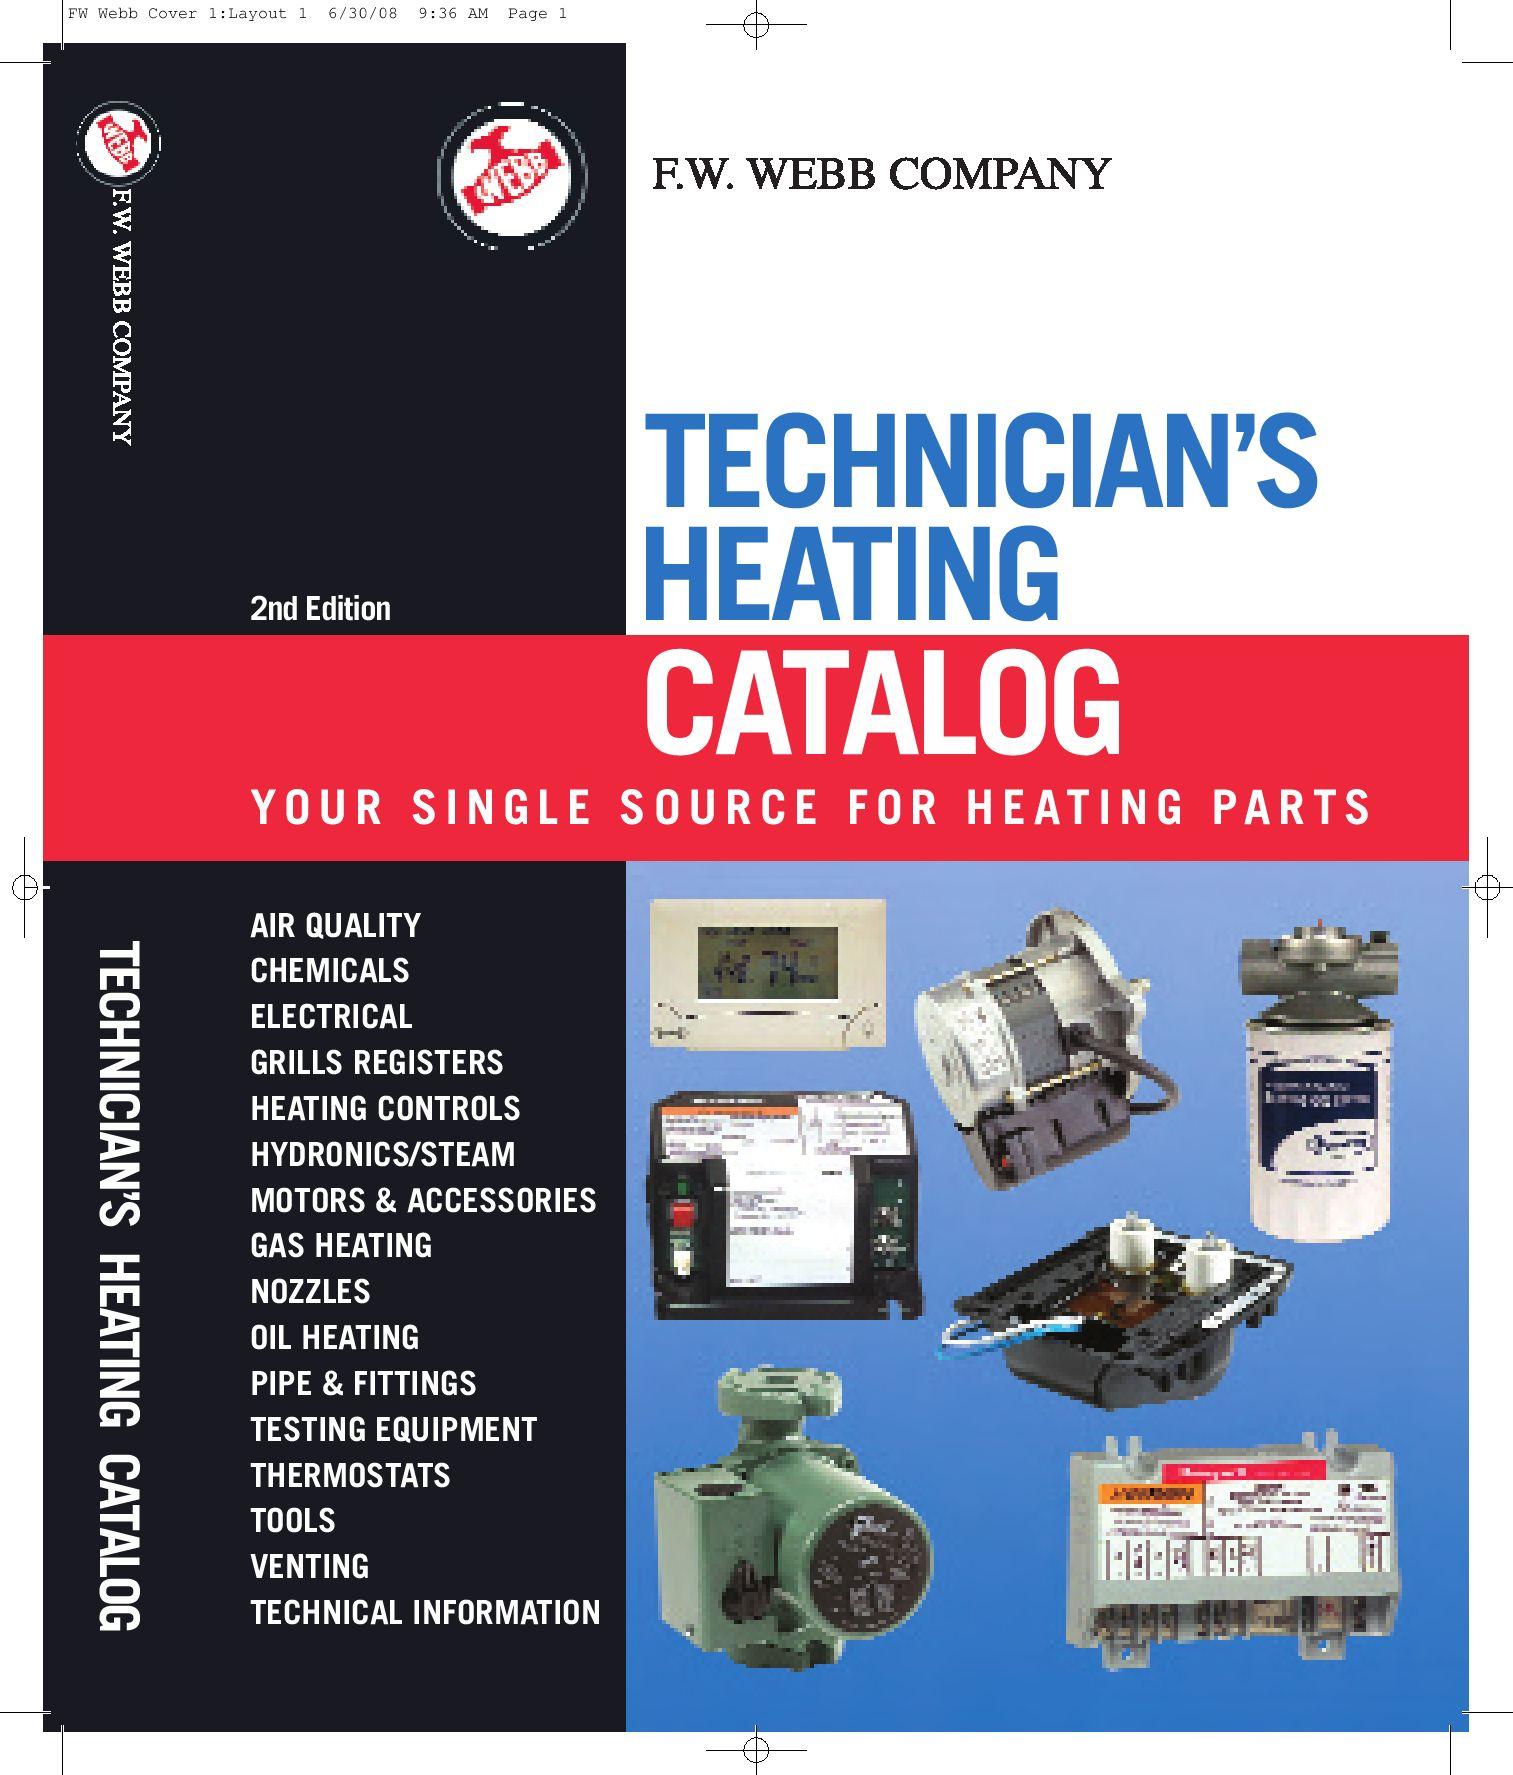 Technician S Heating Catalog By F W Webb Company Issuu